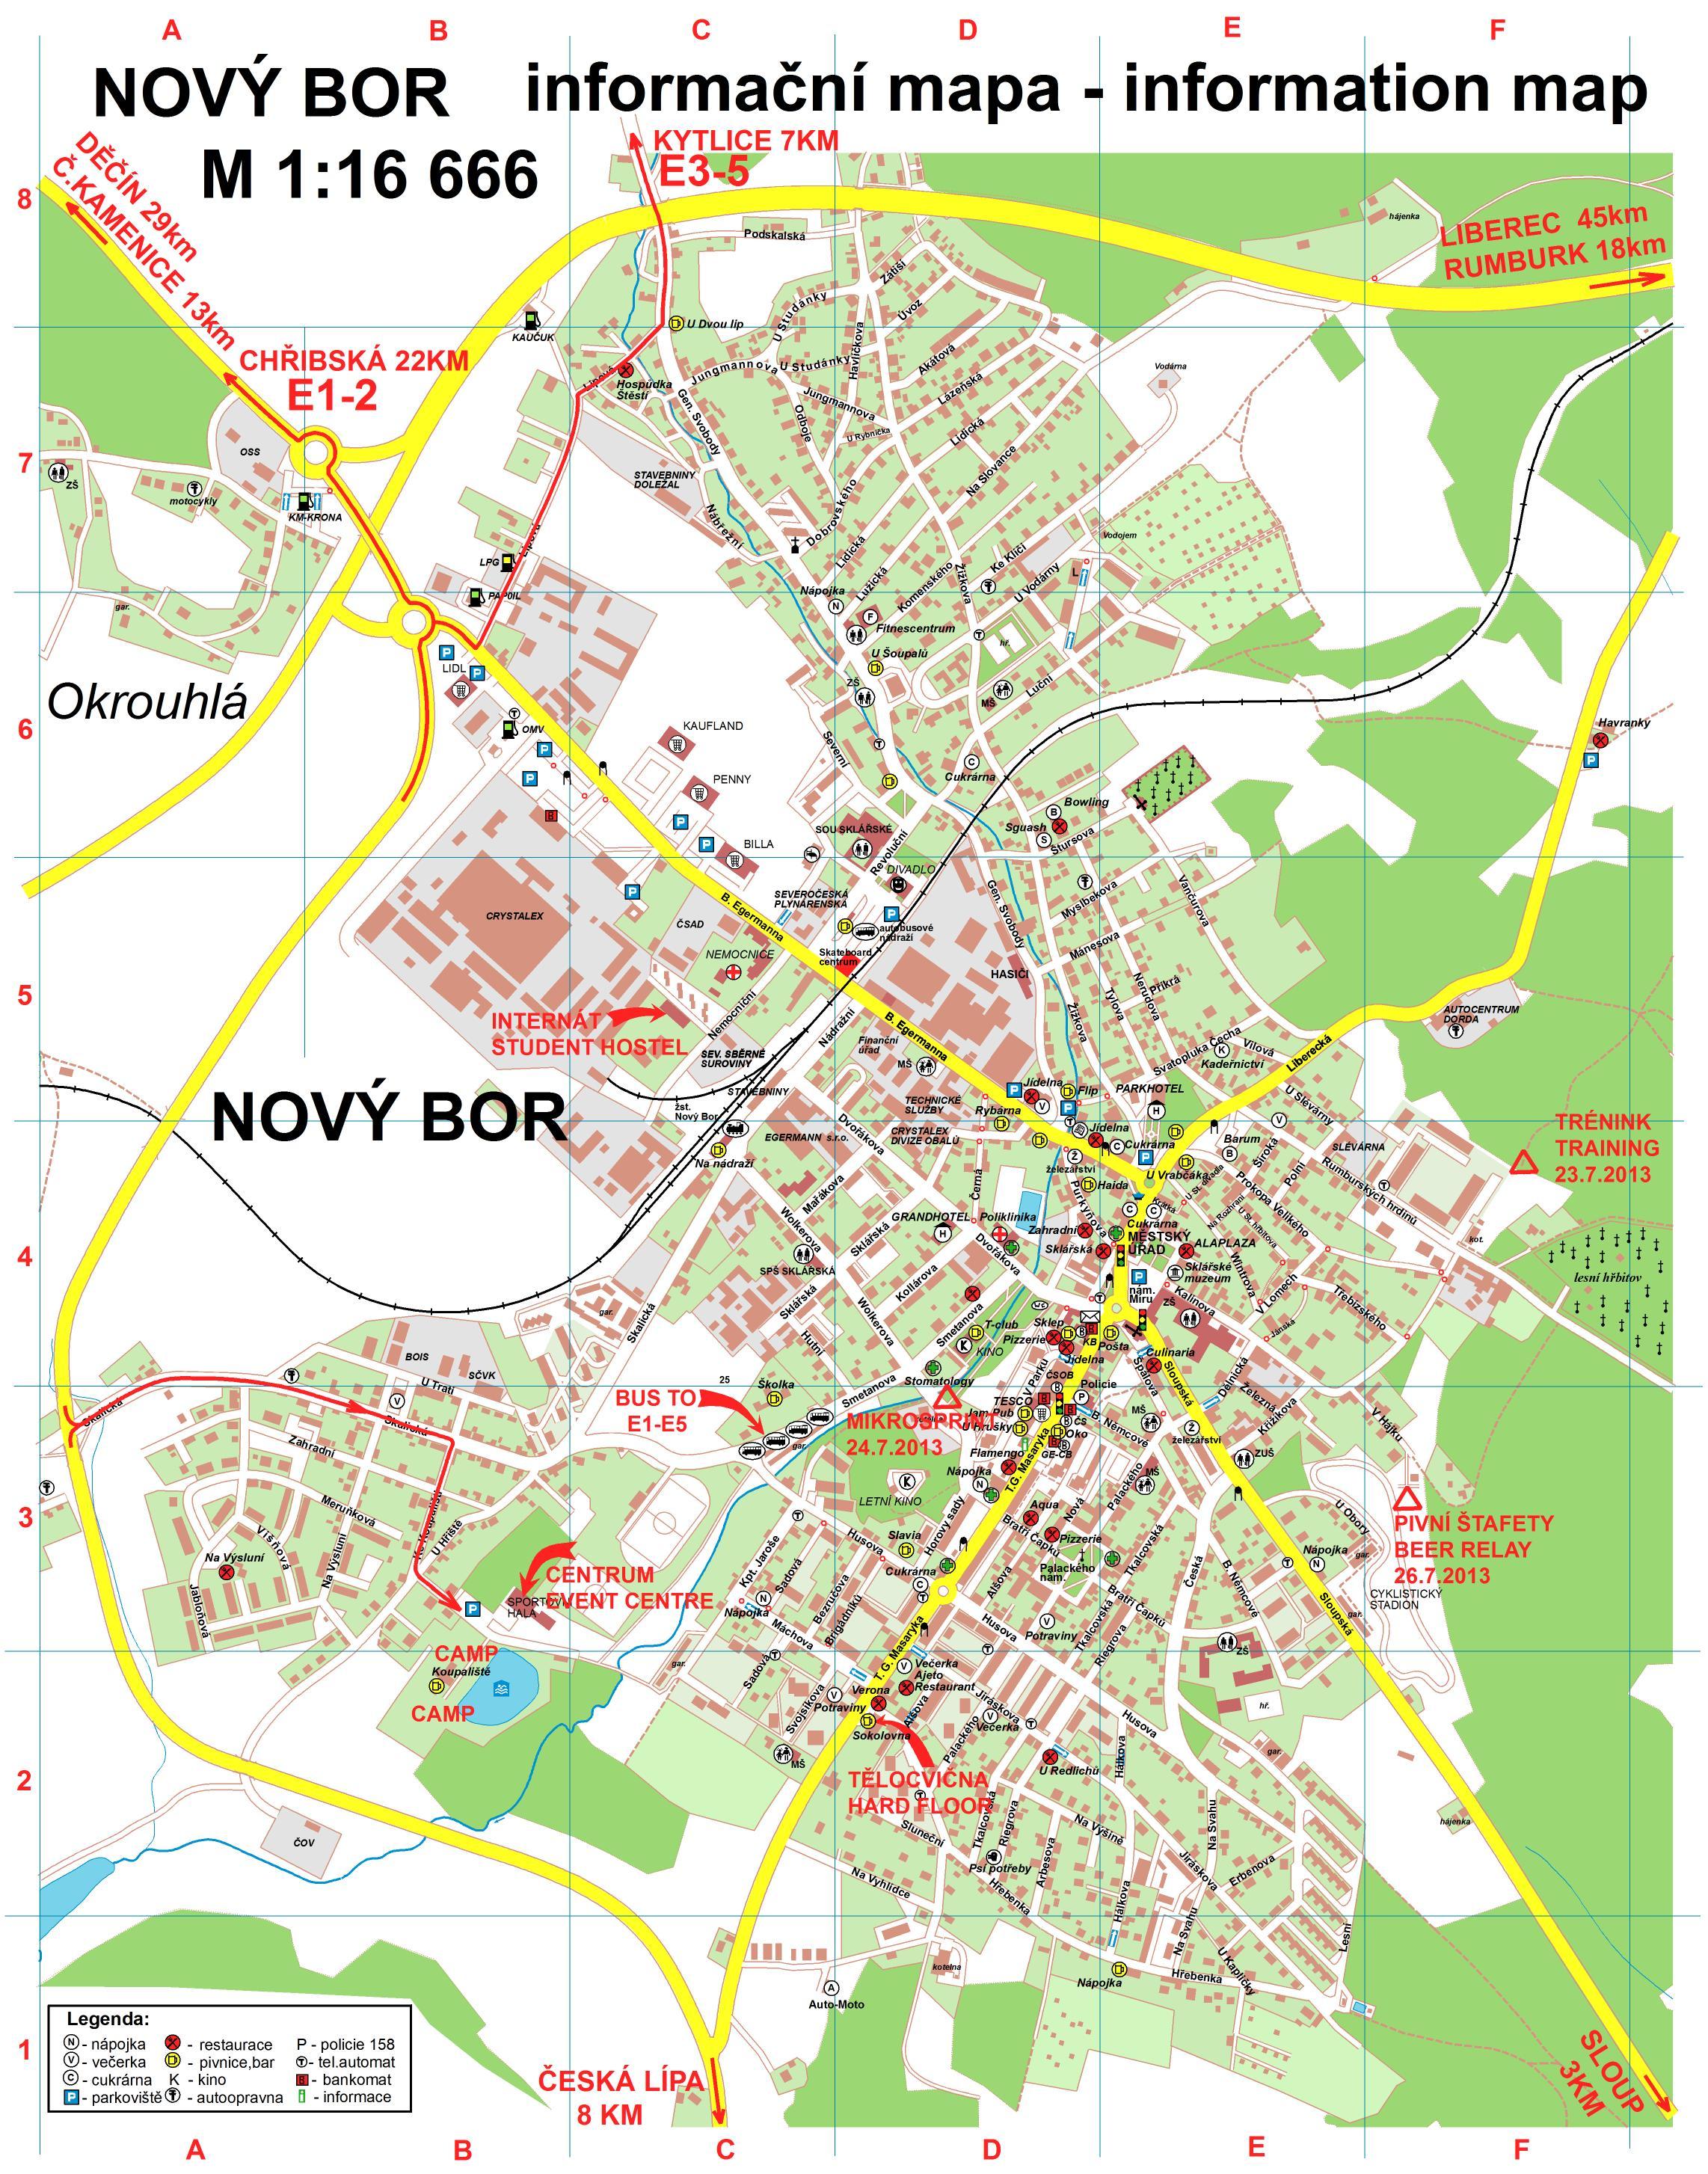 bor mapa Bohemia Orienteering 24. 28.7.2013 | Kytlice & Chřibská; very  bor mapa